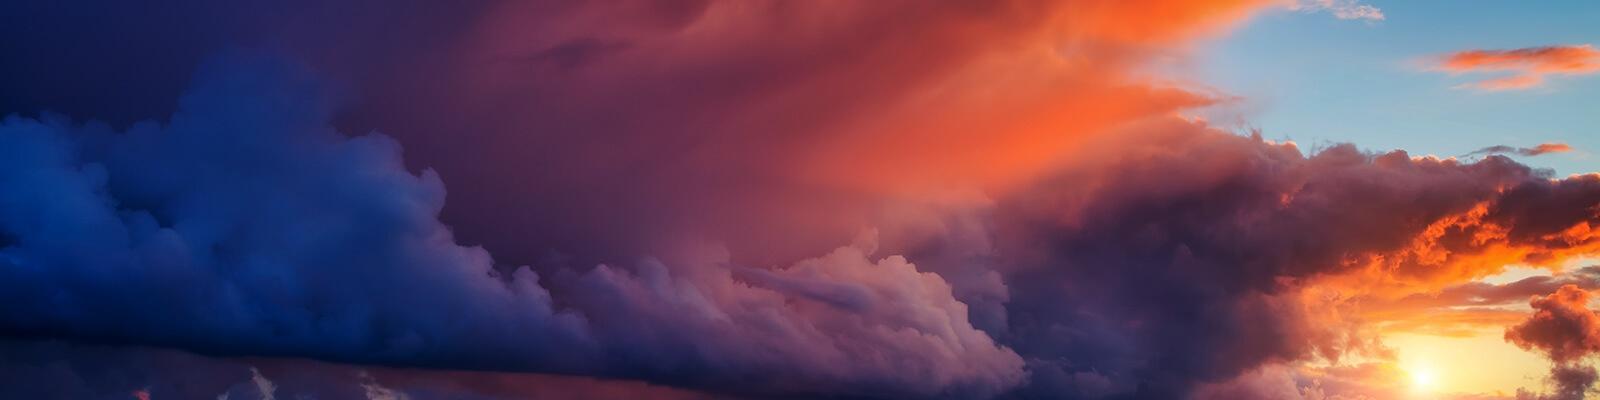 Cloud-banners-4.jpg